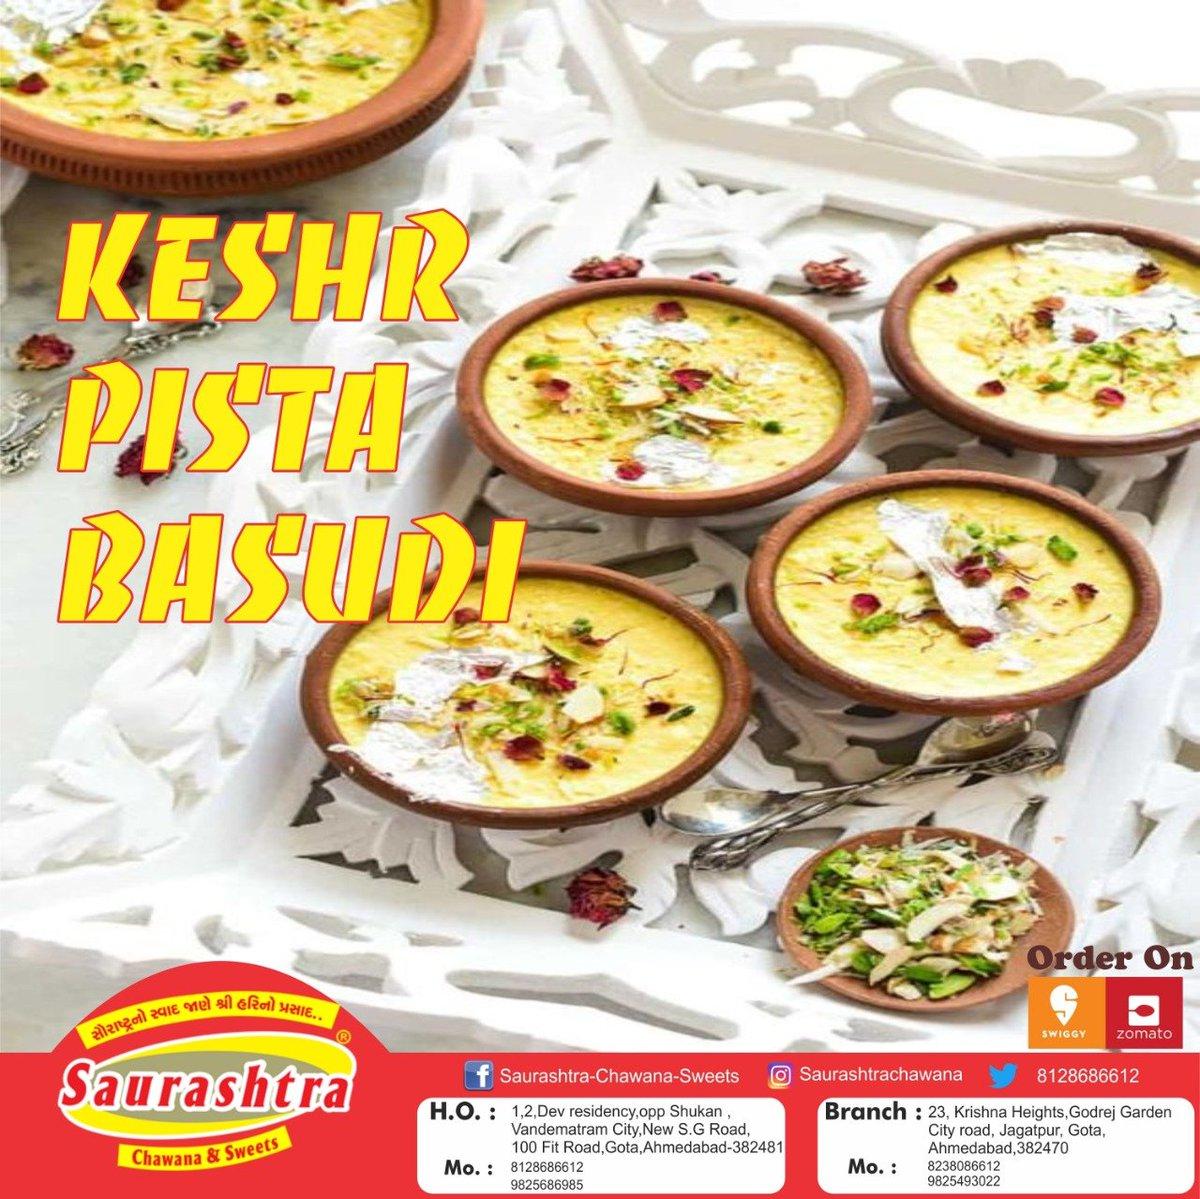 Keshar Pista Basudi Yummy sweet on Saurashtra Chawana & Sweets . . .. #sweets #dessert #food #chocolate #foodporn #yummy #foodie #cake #sweet #delicious #desserts #instafood #love #candy #cakes #sweettooth #foodphotography #cookies #christmas #treats #homemade #baking